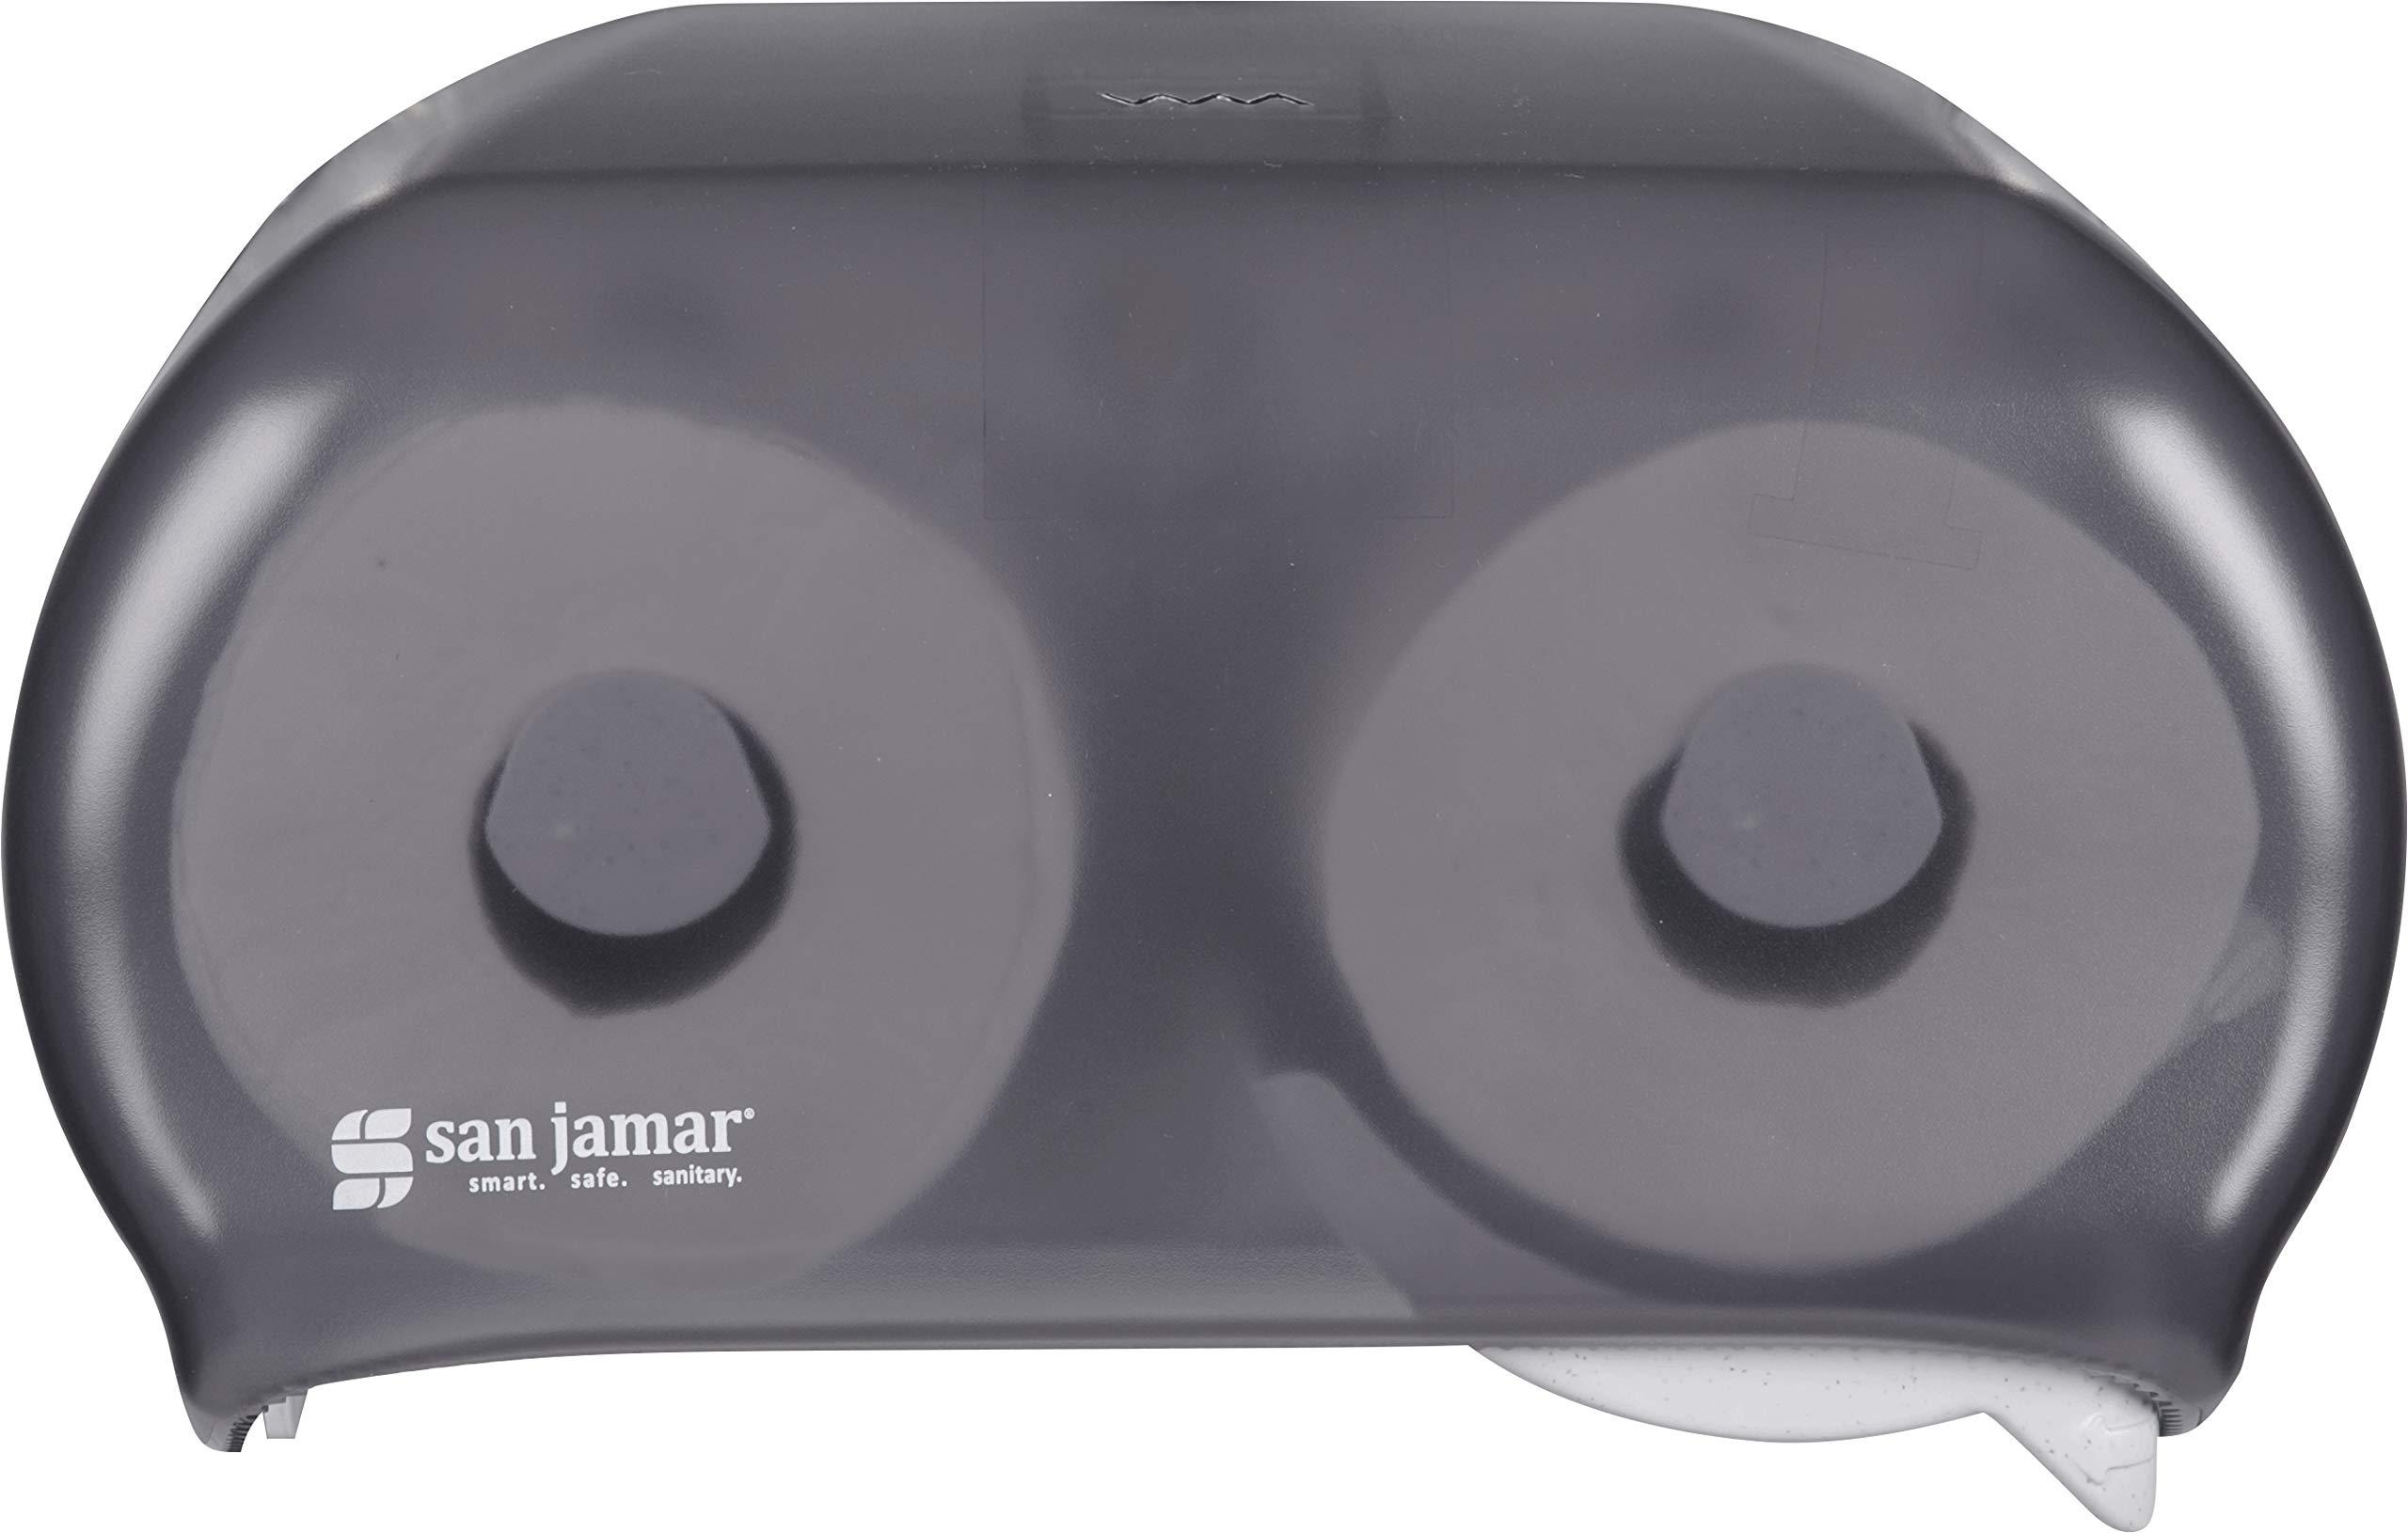 San Jamar R3600TBK Versa twin Dual Bath Tissue Dispenser, 1.437'' Mandrel, Black Pearl (TTD105)